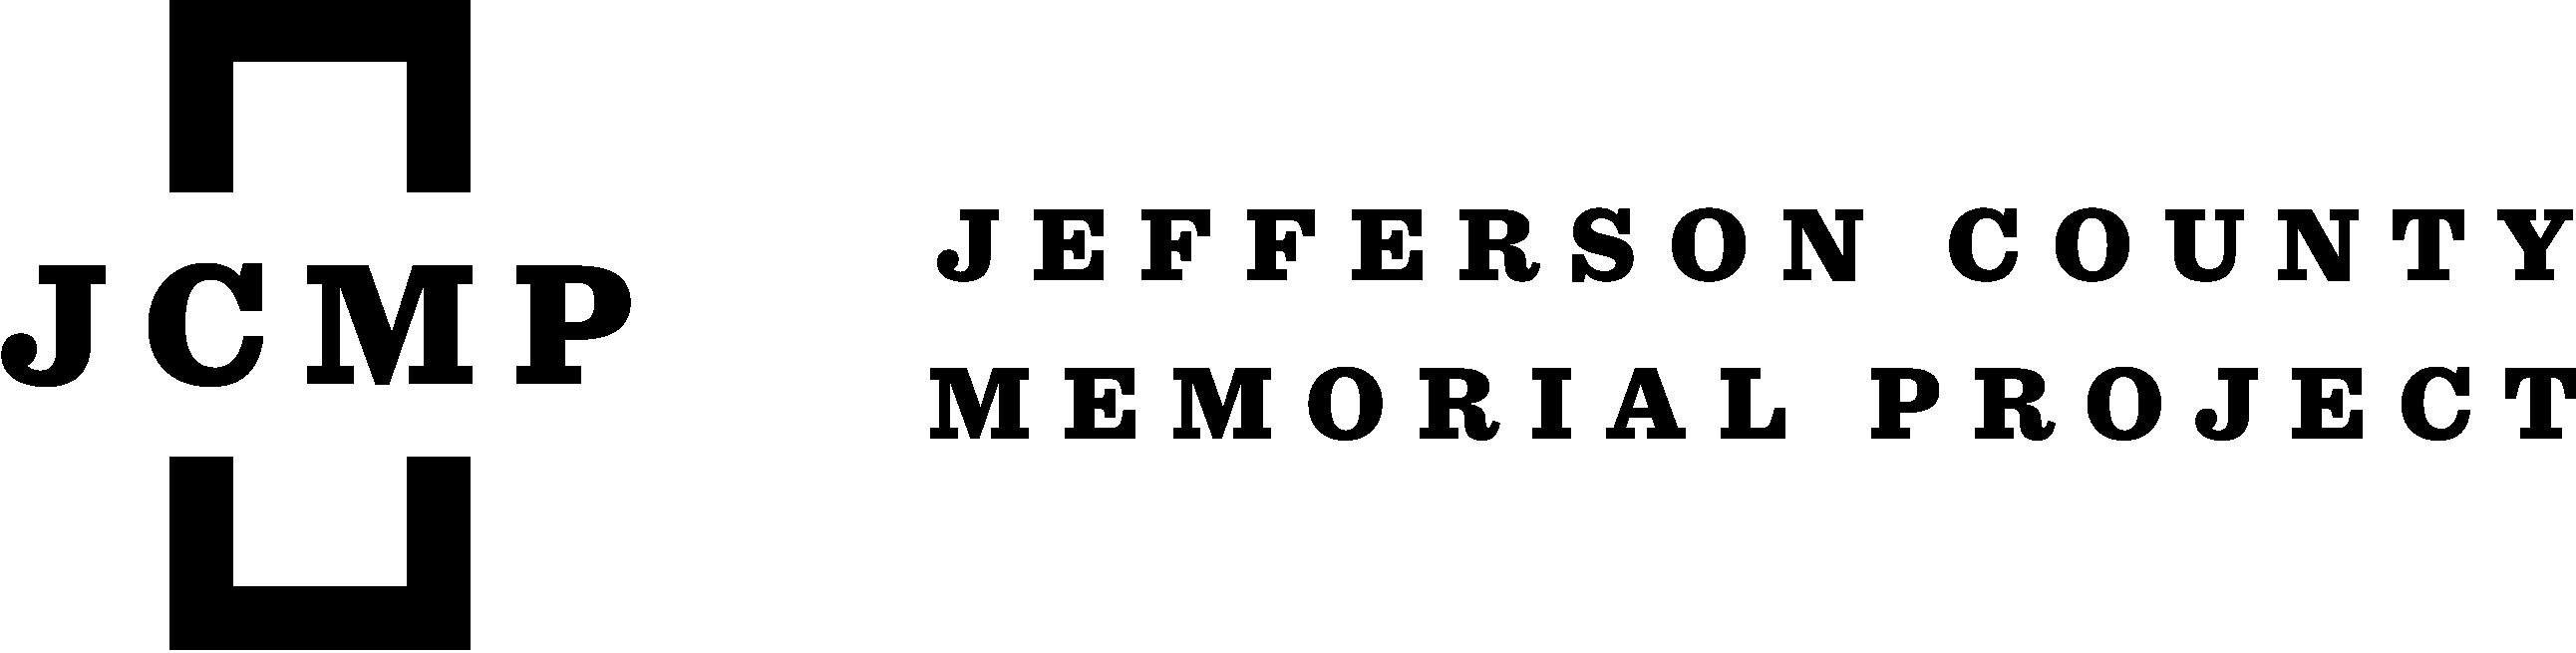 JCMP image